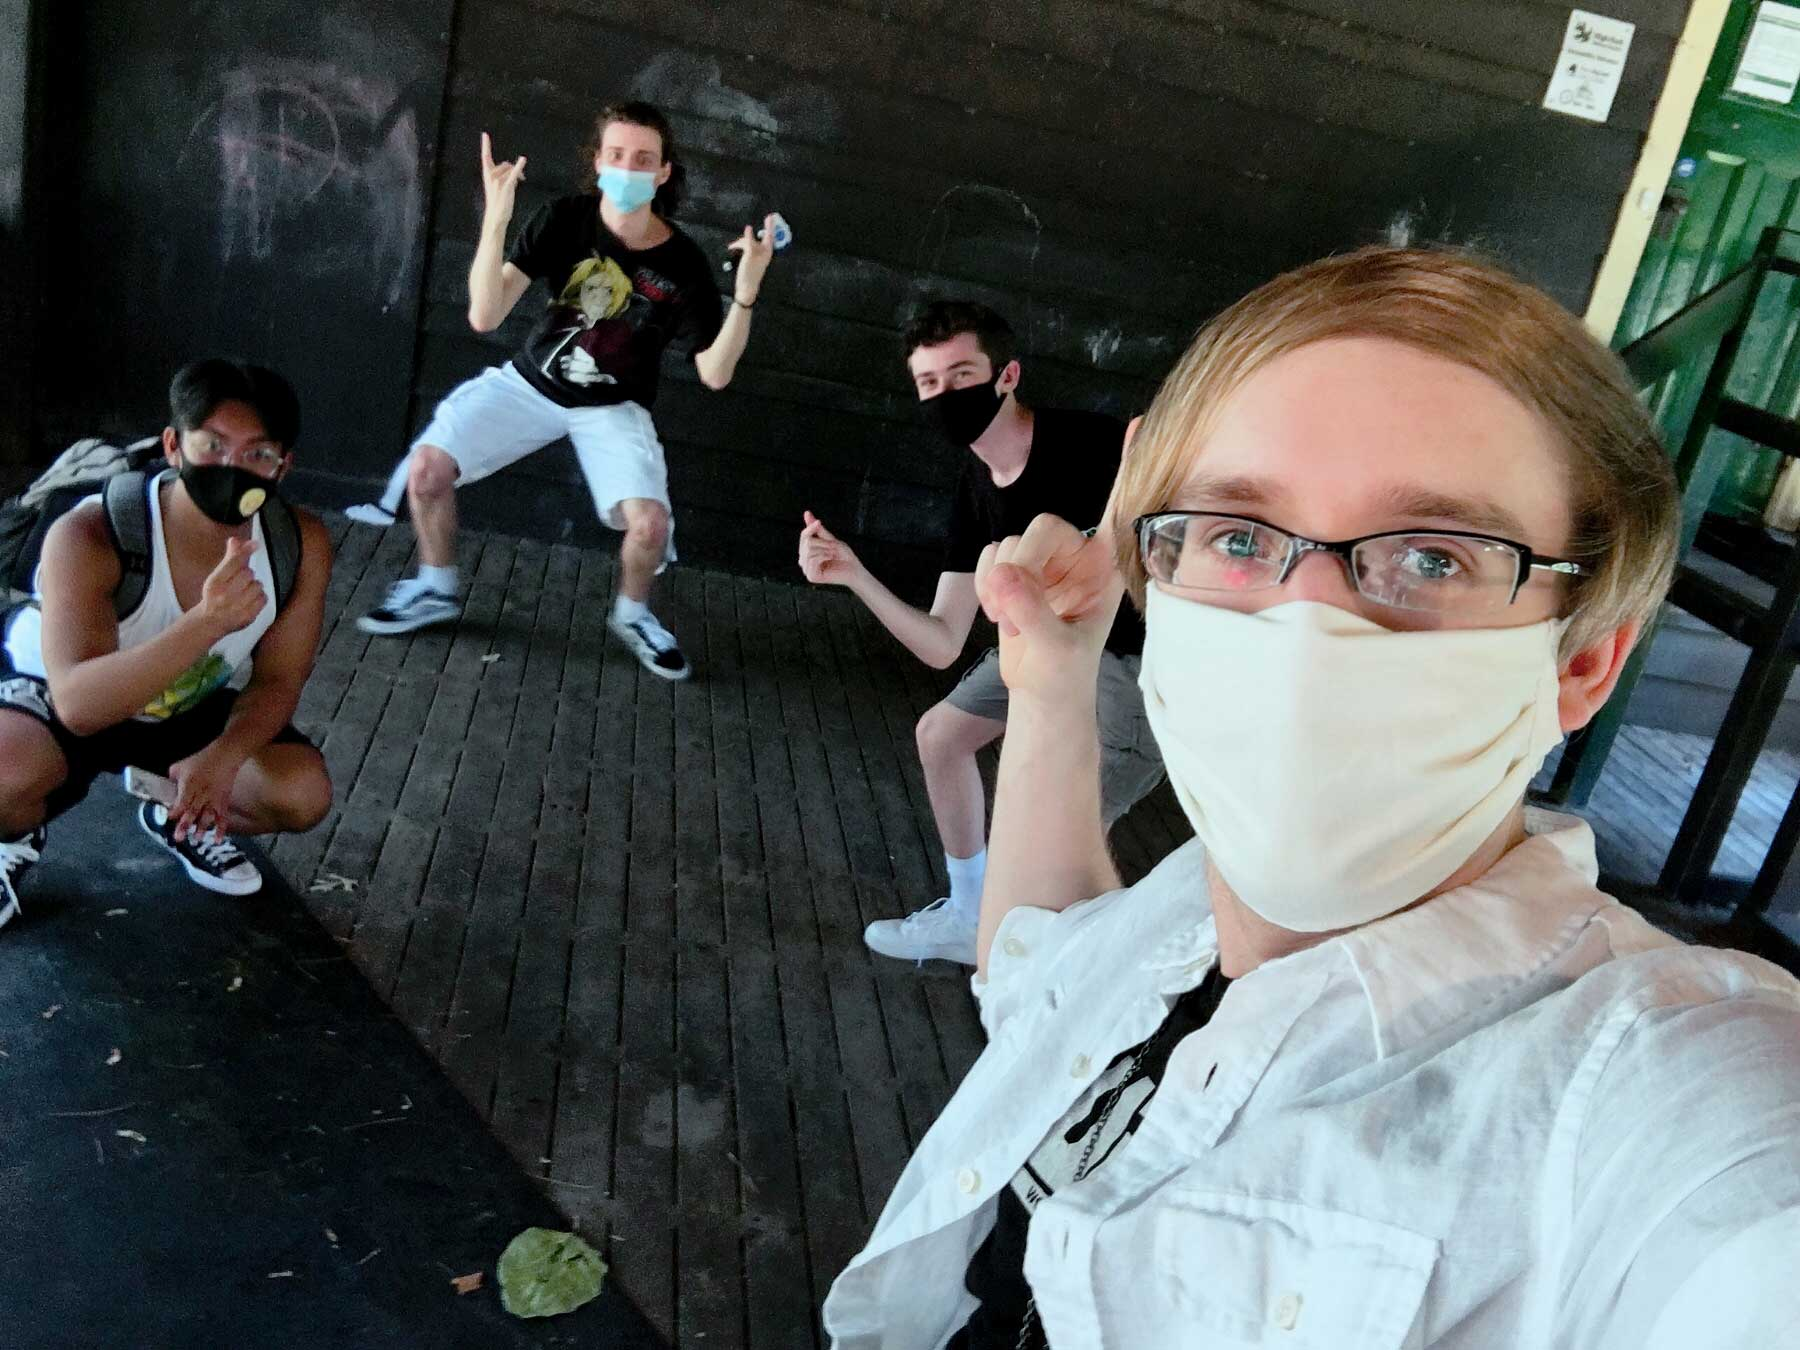 blader kei selfie with mitsu 1234beyblade and jesseobre